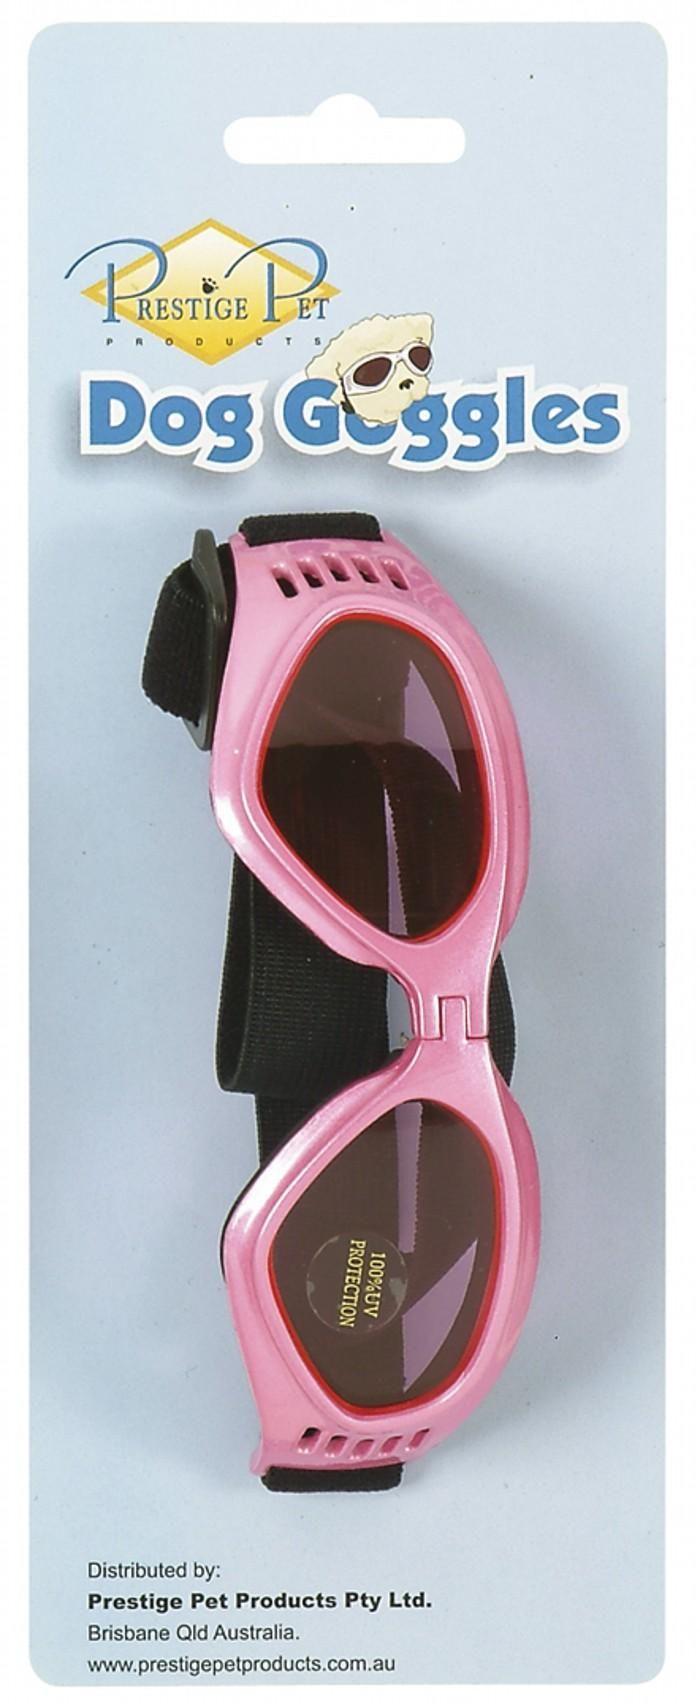 Doggles - Dog Glasses